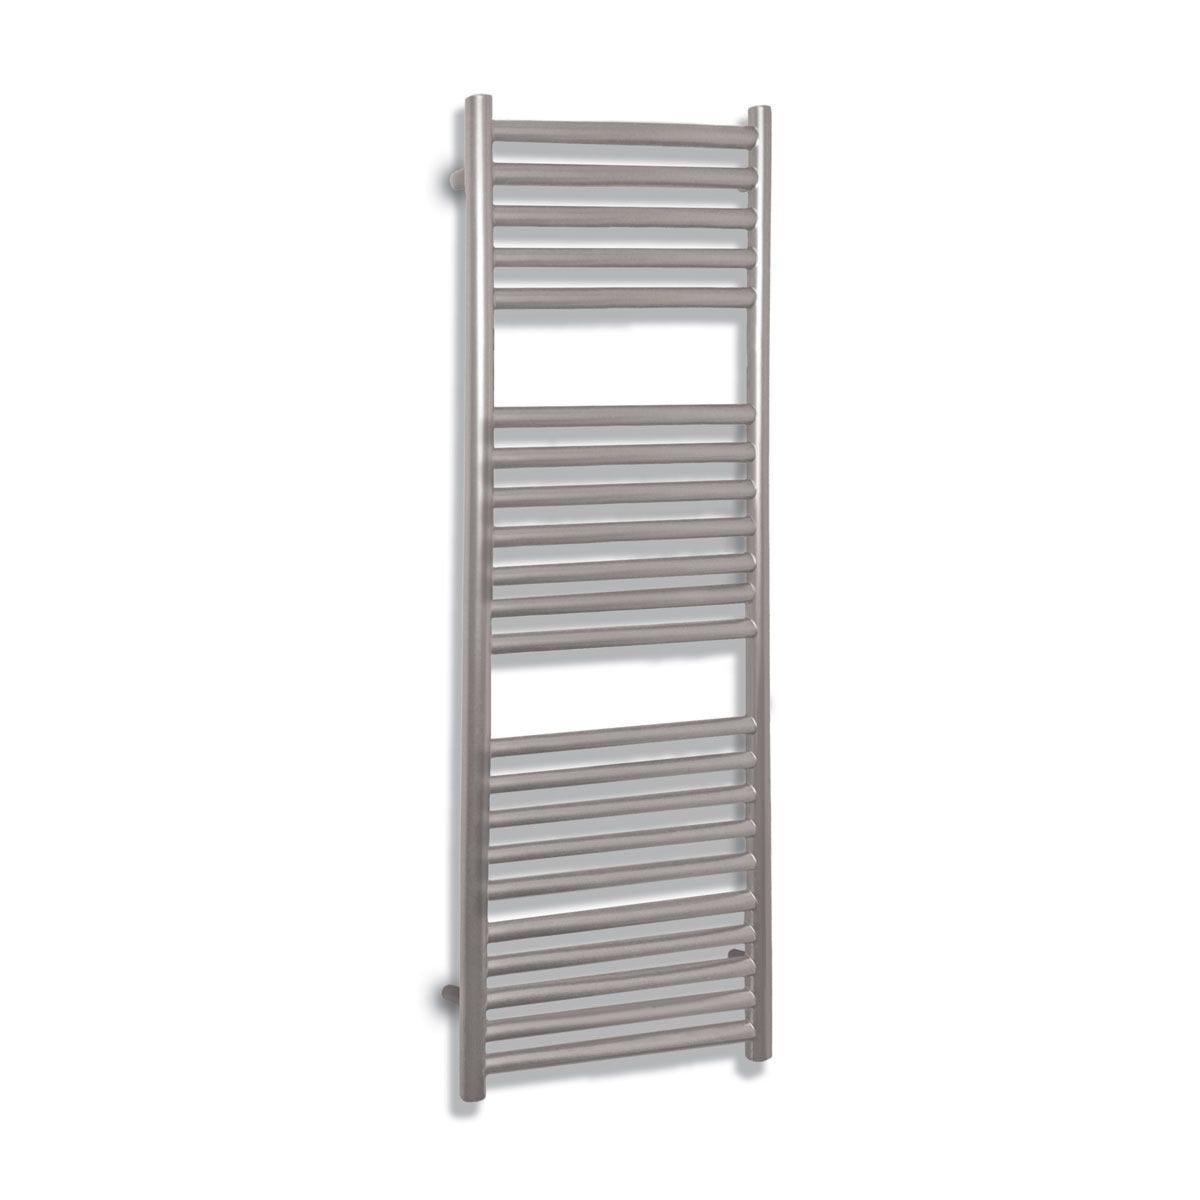 Heating Style Joanna Towel Warmer 1200mm x 500mm - Silver